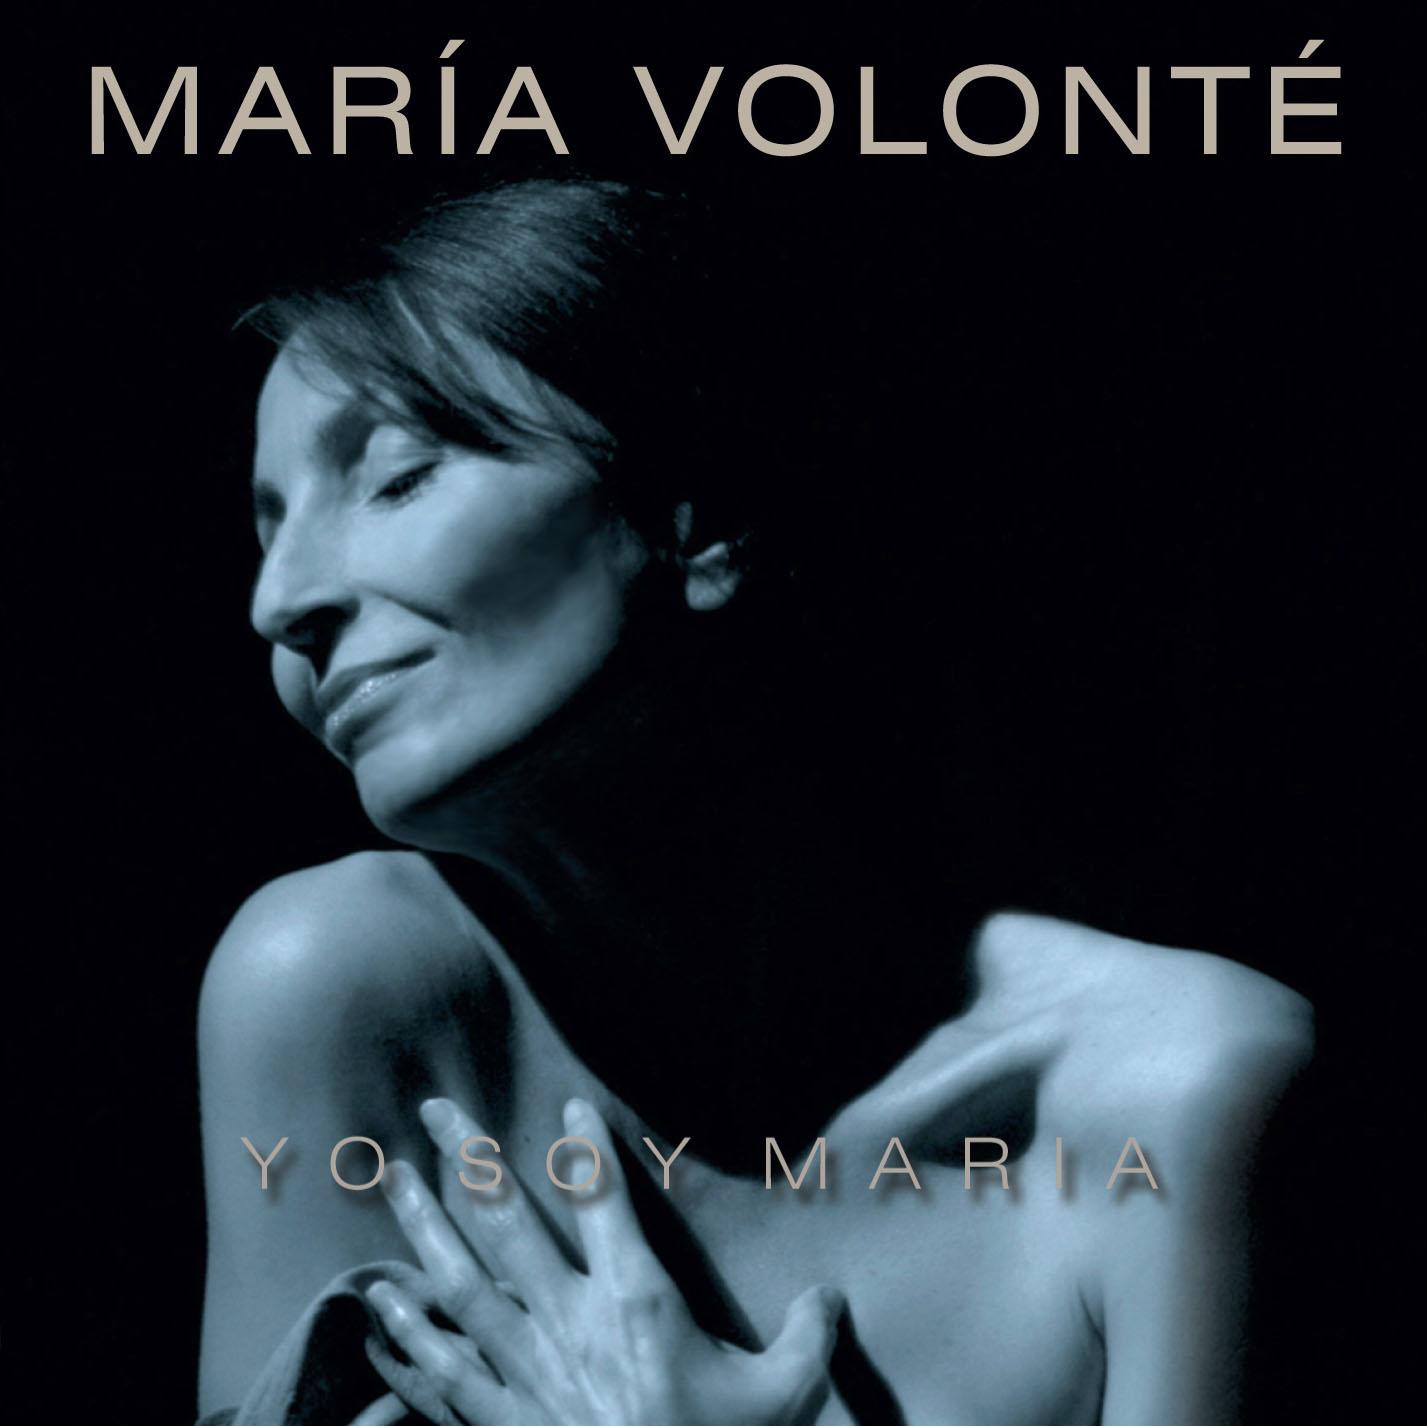 Maria Volonte: Artist Video